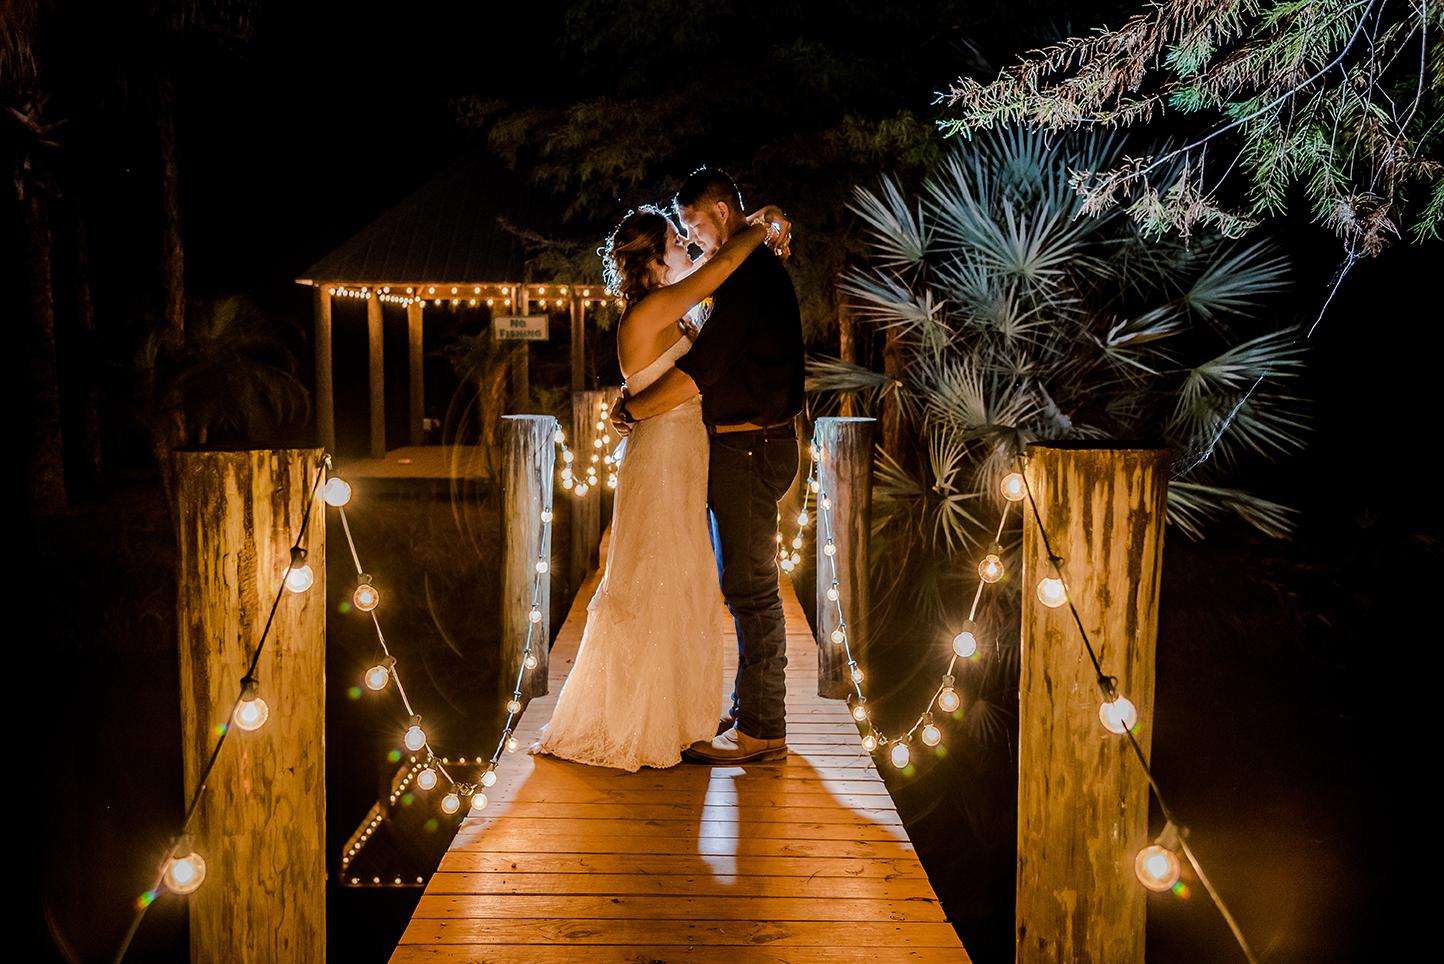 Florida-cowbow-fall-theme-amanda-wedding-1-2(3).jpg